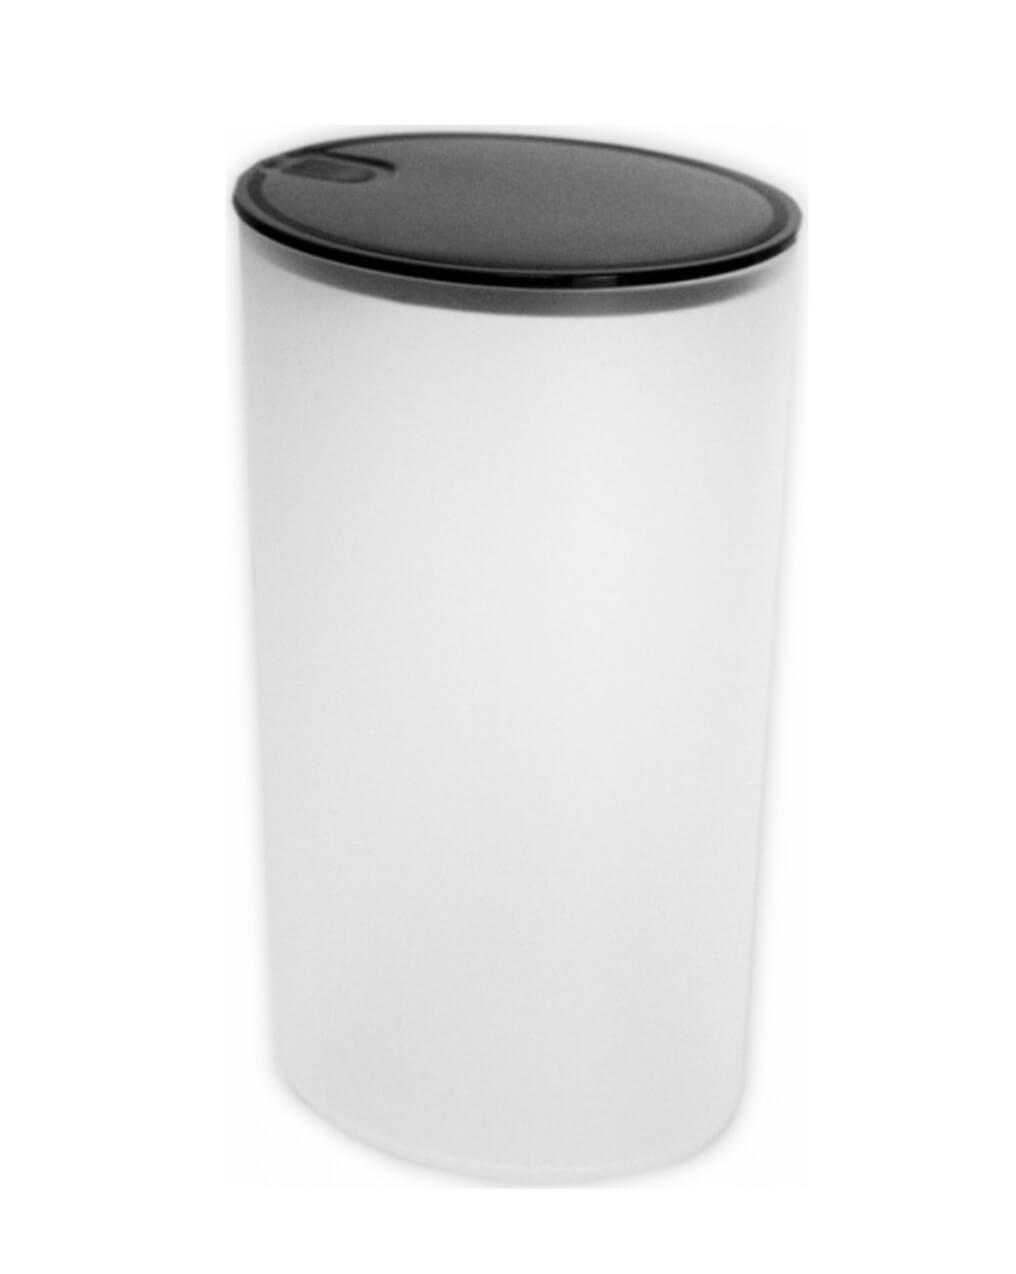 Онлайн каталог PROMENU: Контейнер для молока Nivona NIMC 900, объем 0,5 л, белый                               NIMC 900